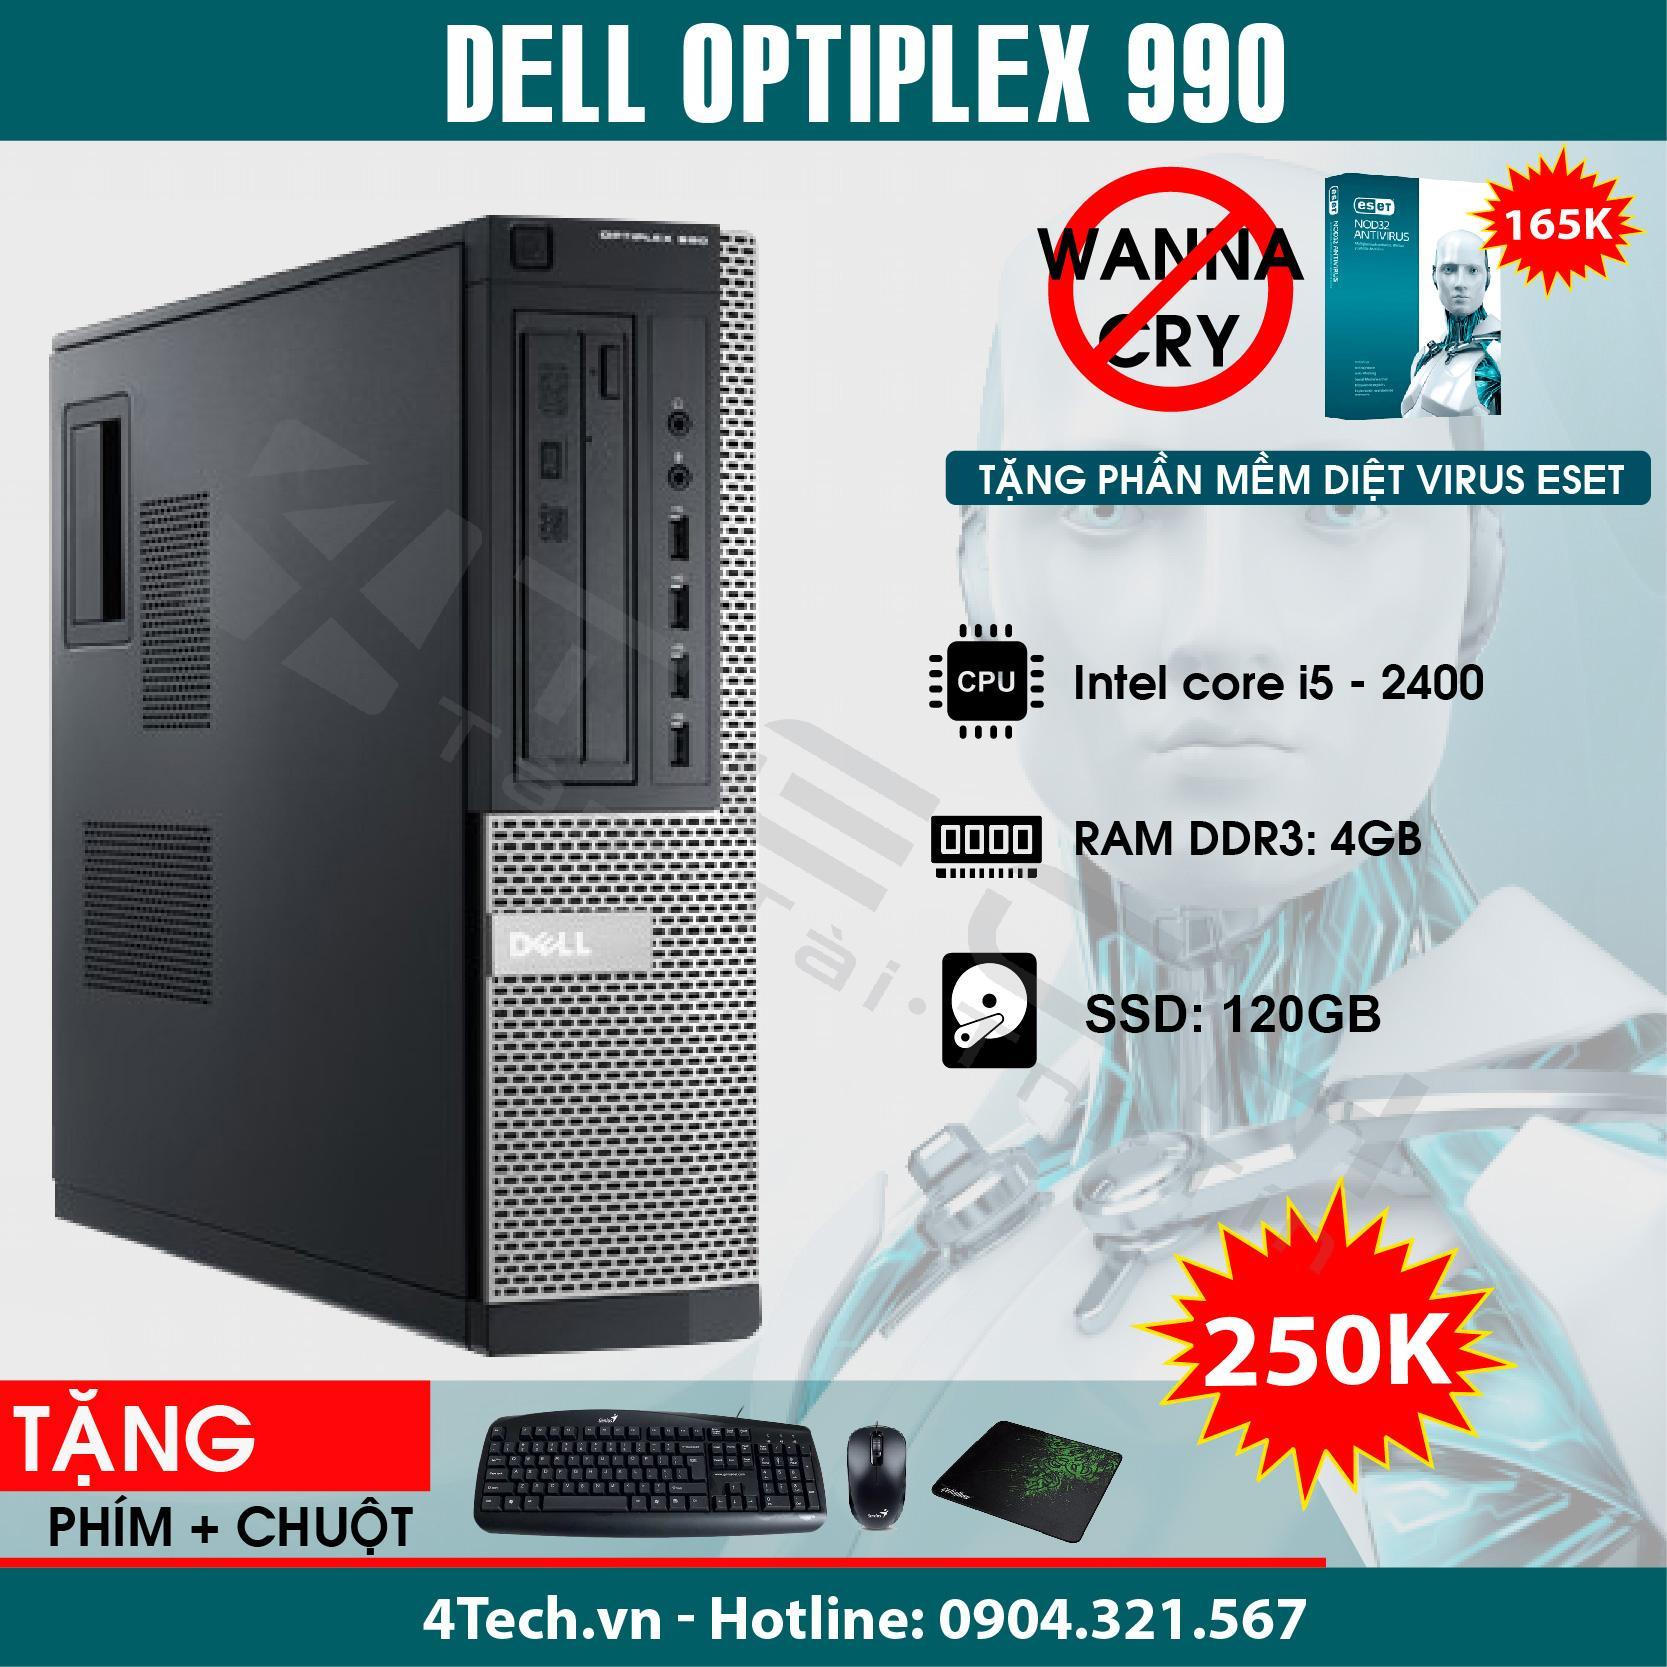 Máy Tính Đồng Bộ Dell Optiplex 990 Intel Core i5-2400, Ram 4GB, SSD 120GB - Mua 1 Tặng 10.